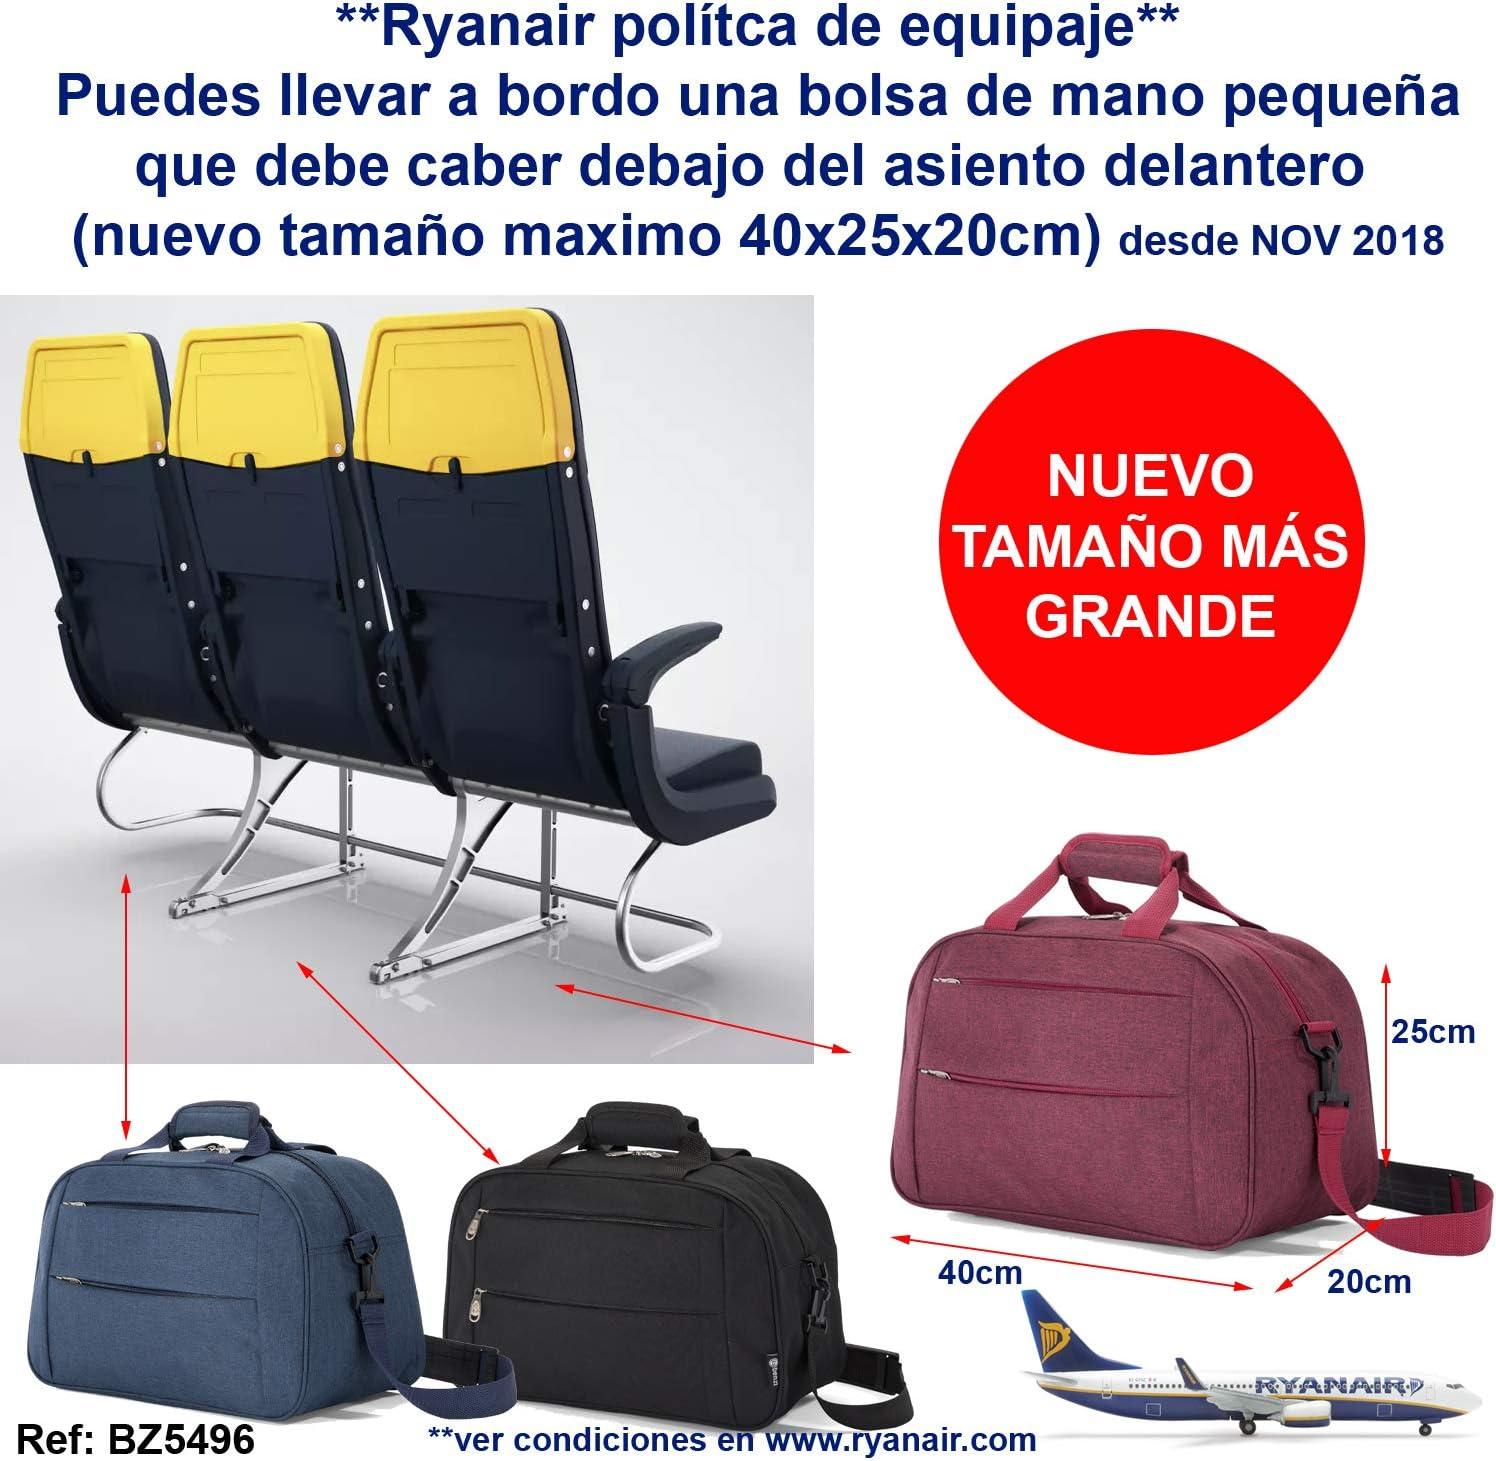 Benzi Bolsa de Viaje 40 x 25 x 20 cm Tamaño Equipaje de Mano Ryanair (5496 Azulx2): Amazon.es: Equipaje